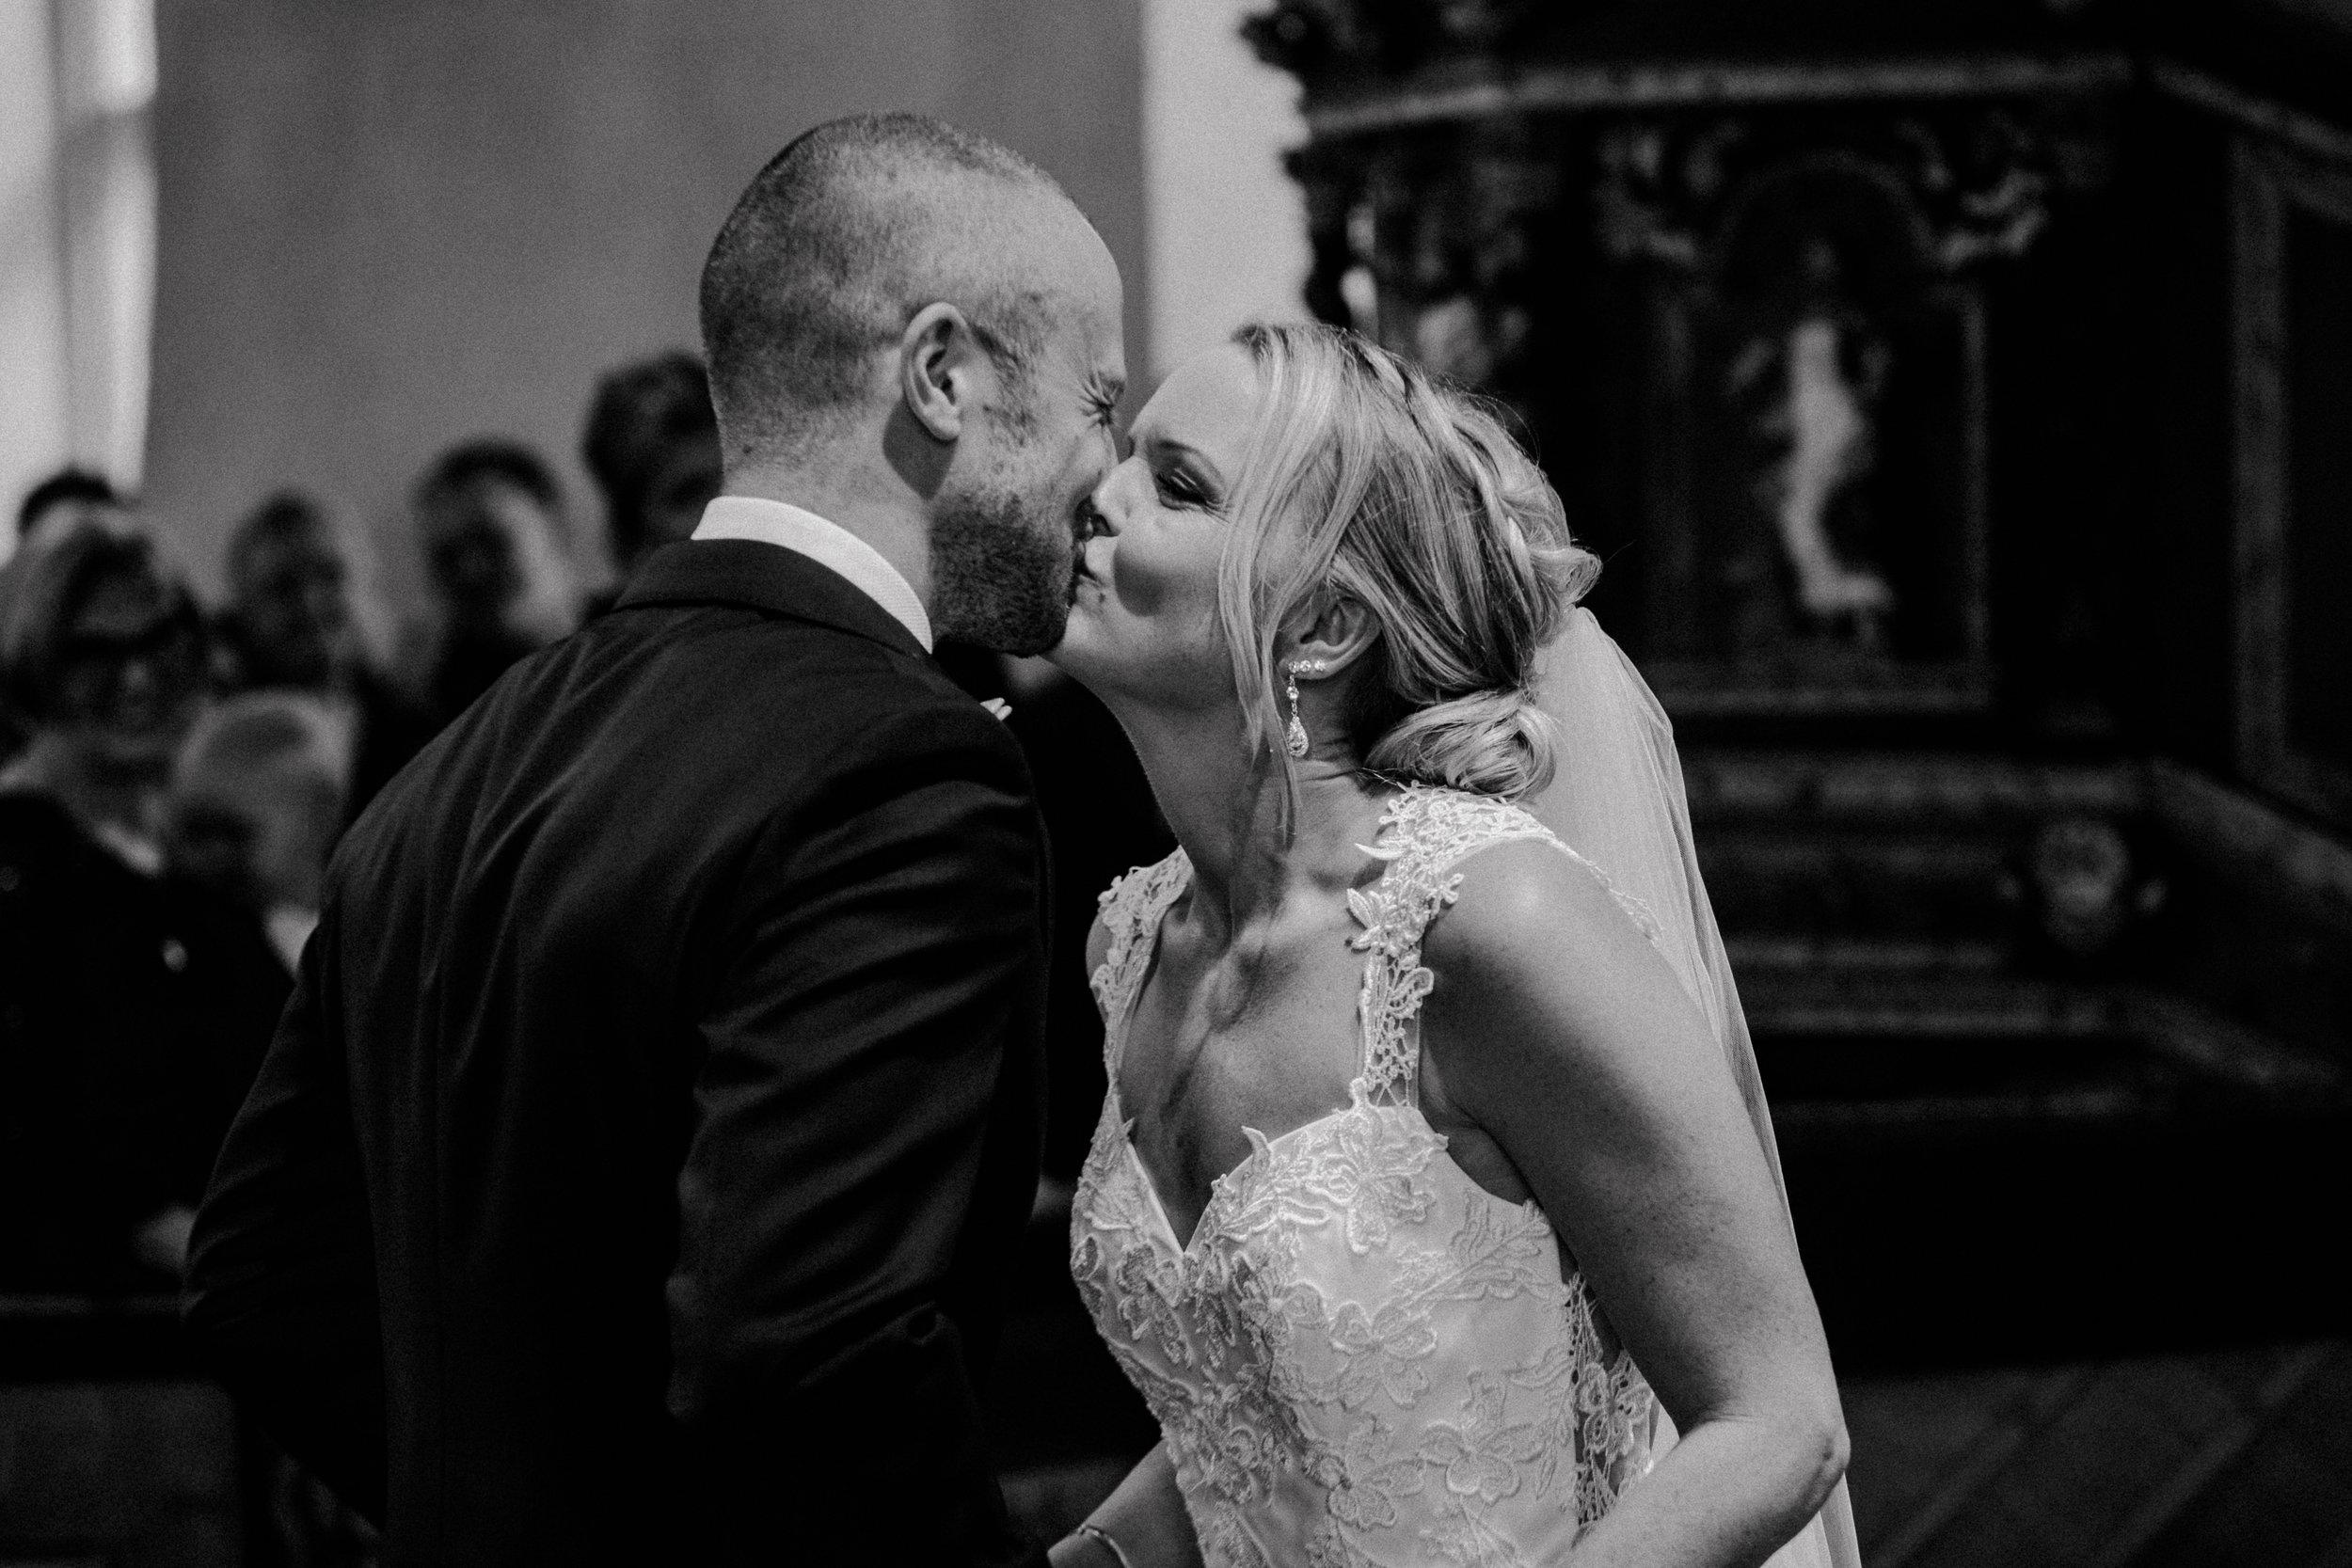 Bröllopsfotograf-Uddetorp Säteri-Höstbröllop-Fotograf Emilia- Bröllopsfotograf Borås-37.jpg